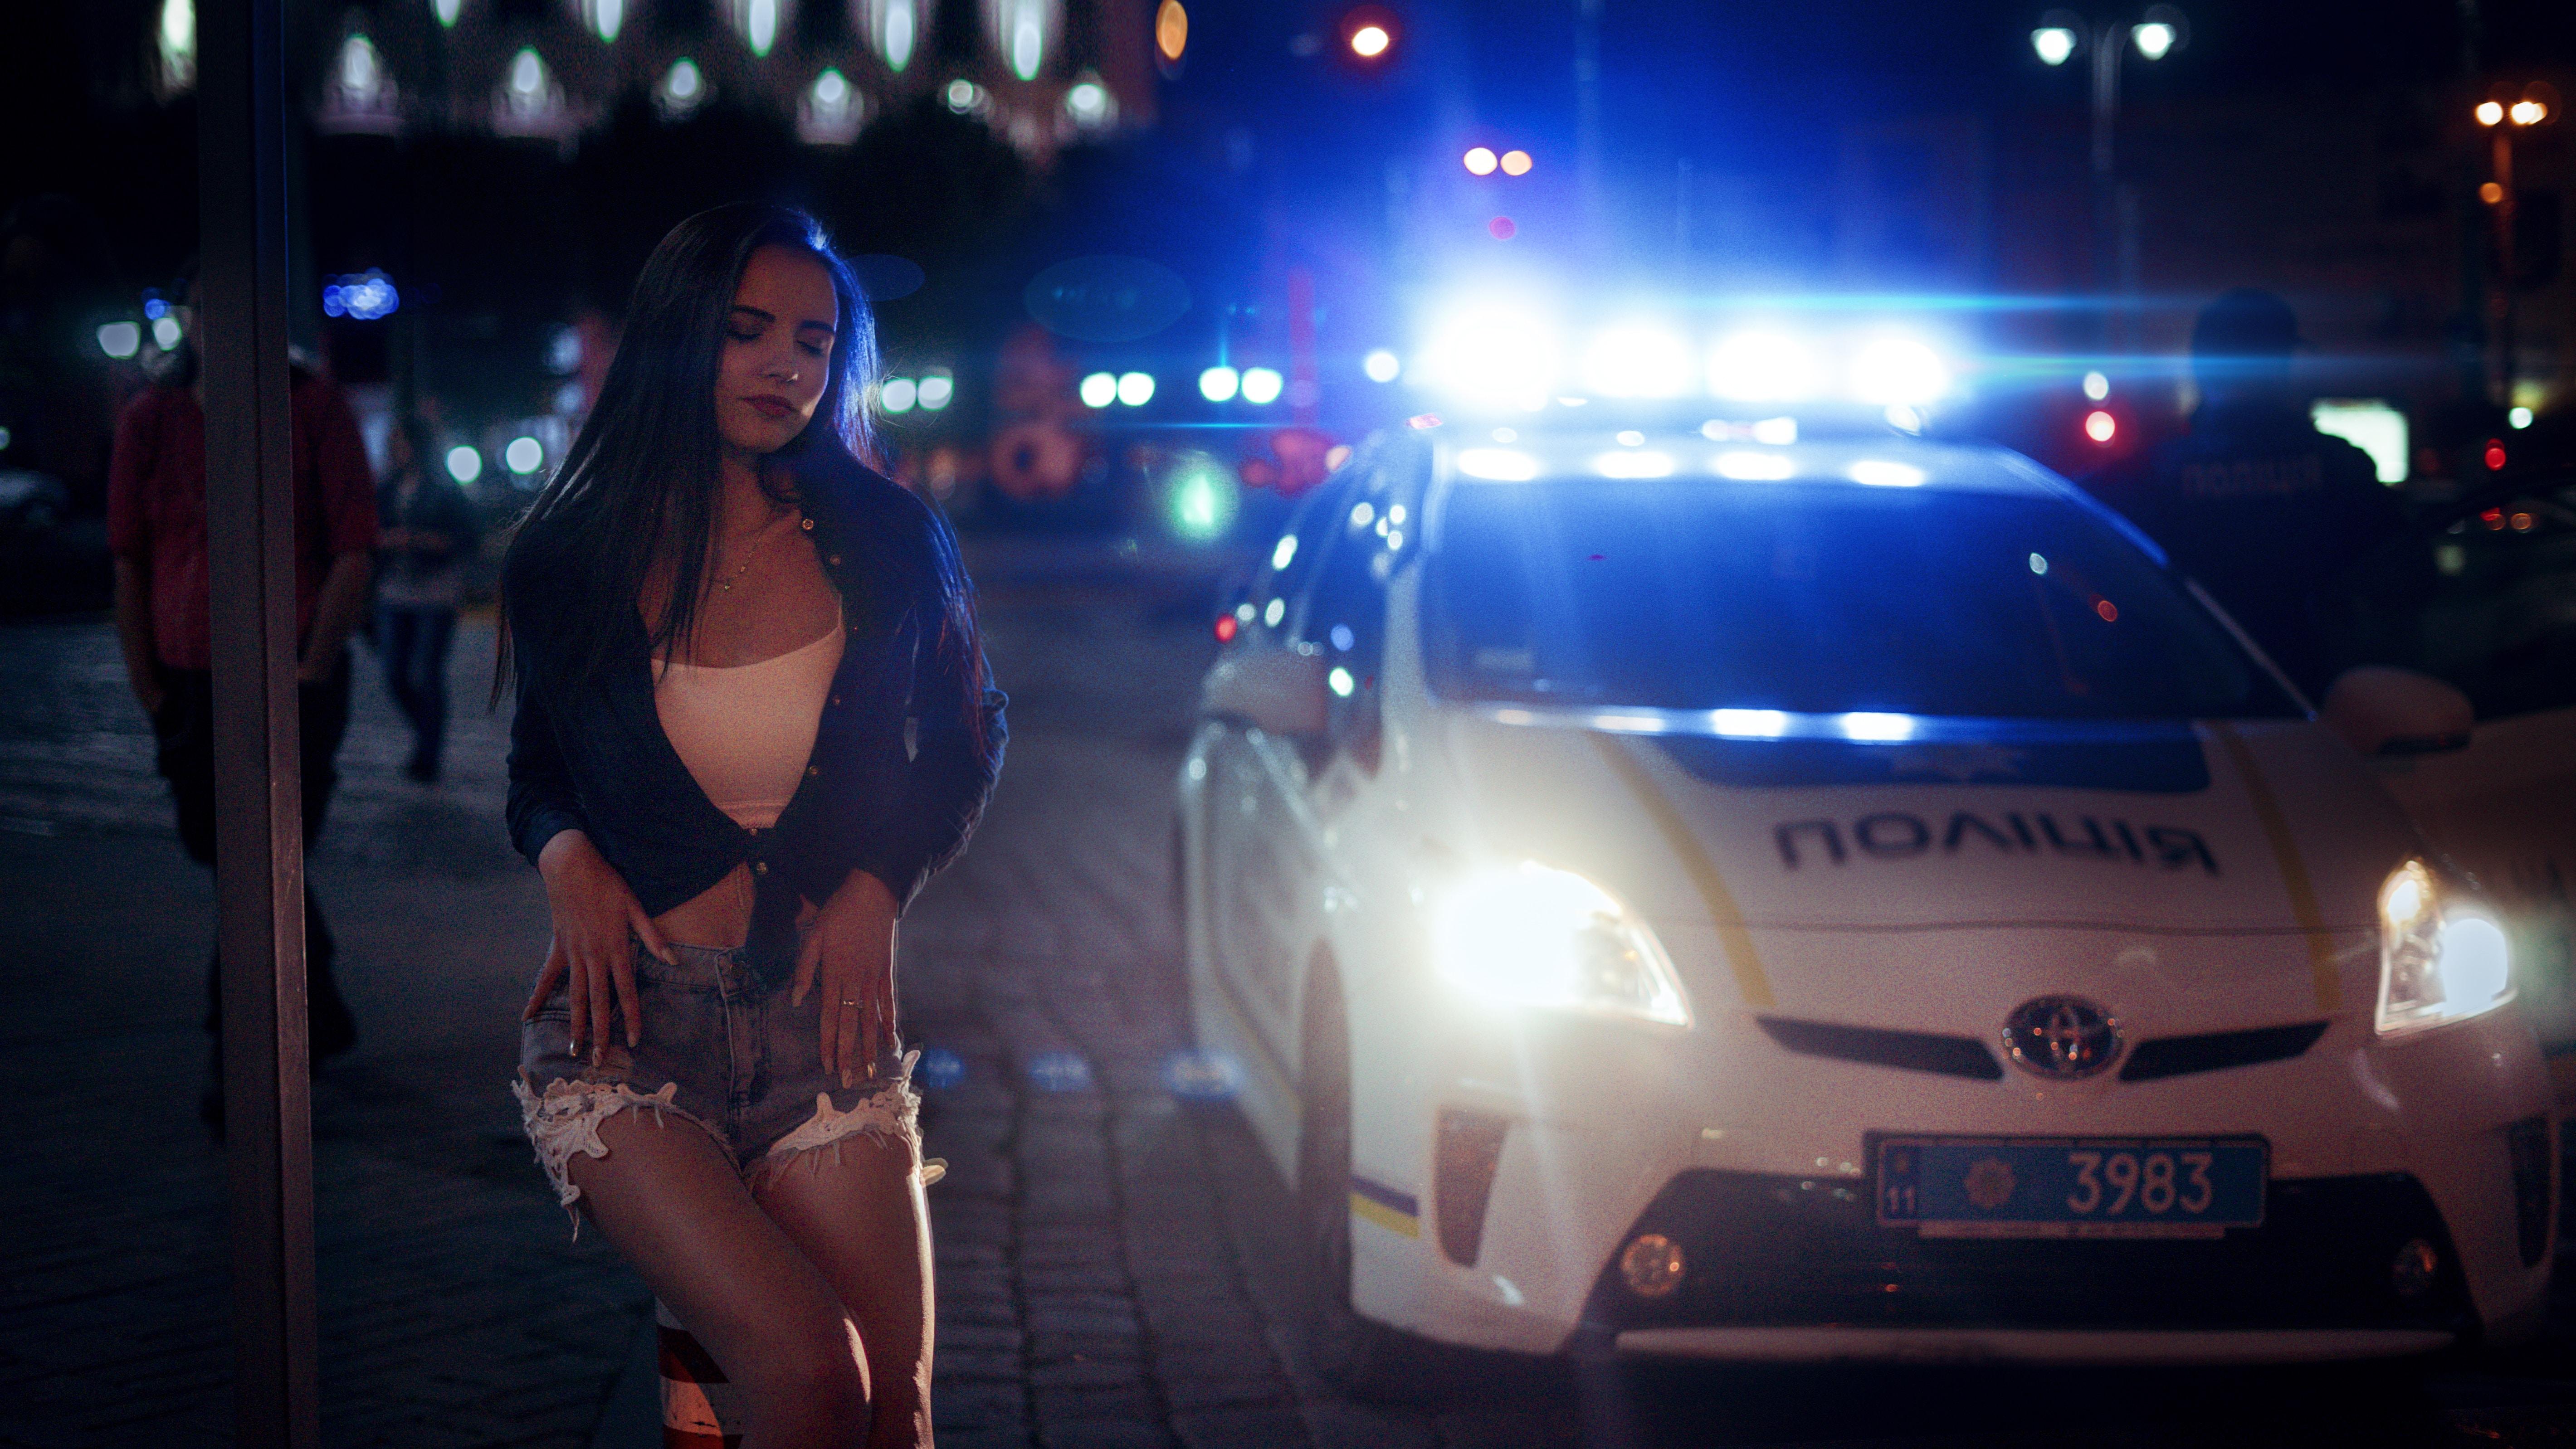 woman beside white Toyota car